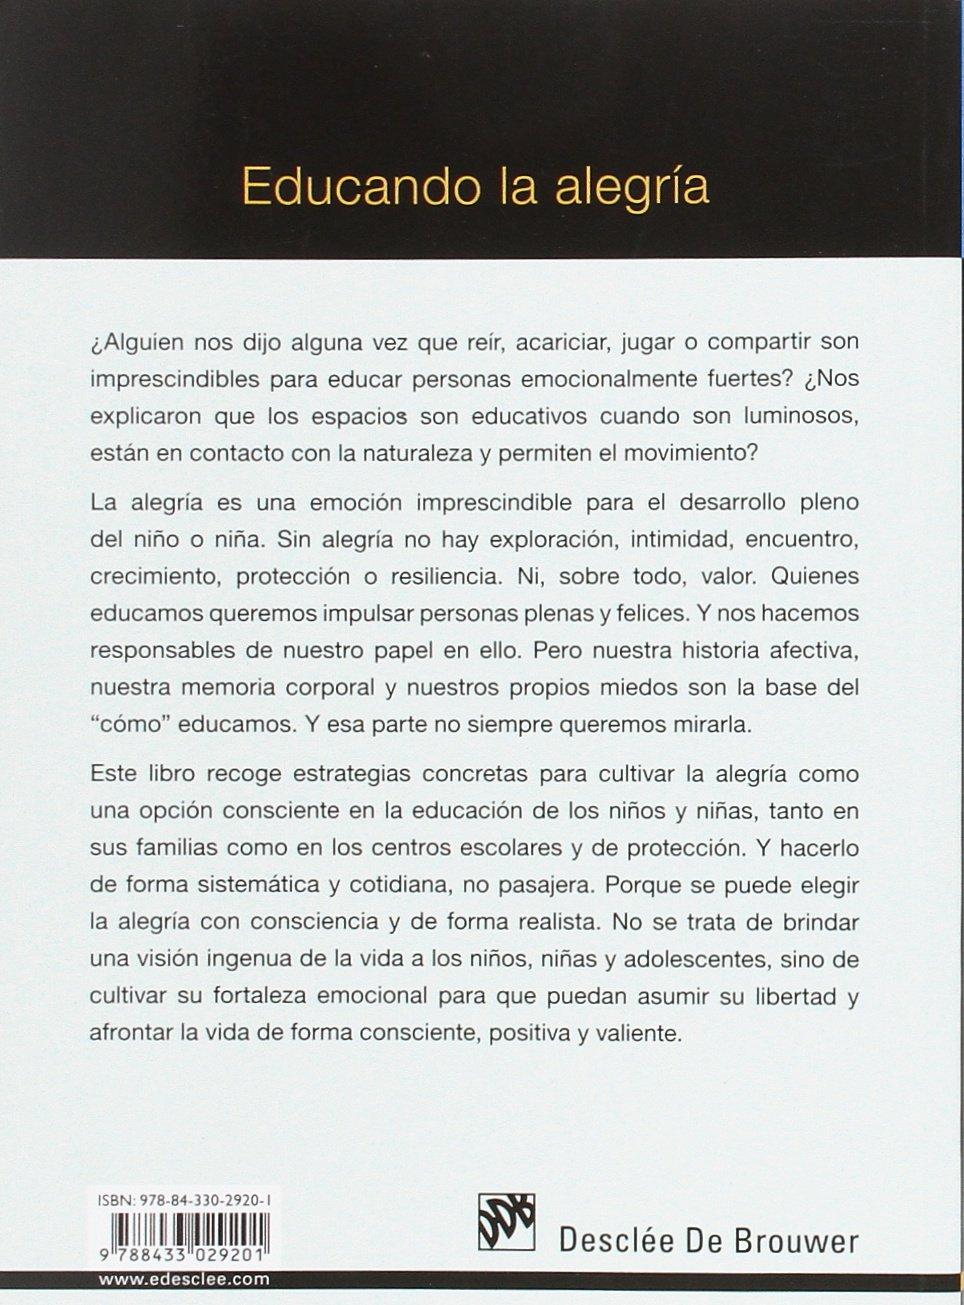 Educando la alegria: 0 (AMAE): Amazon.es: Pepa Horno Goicoechea ...